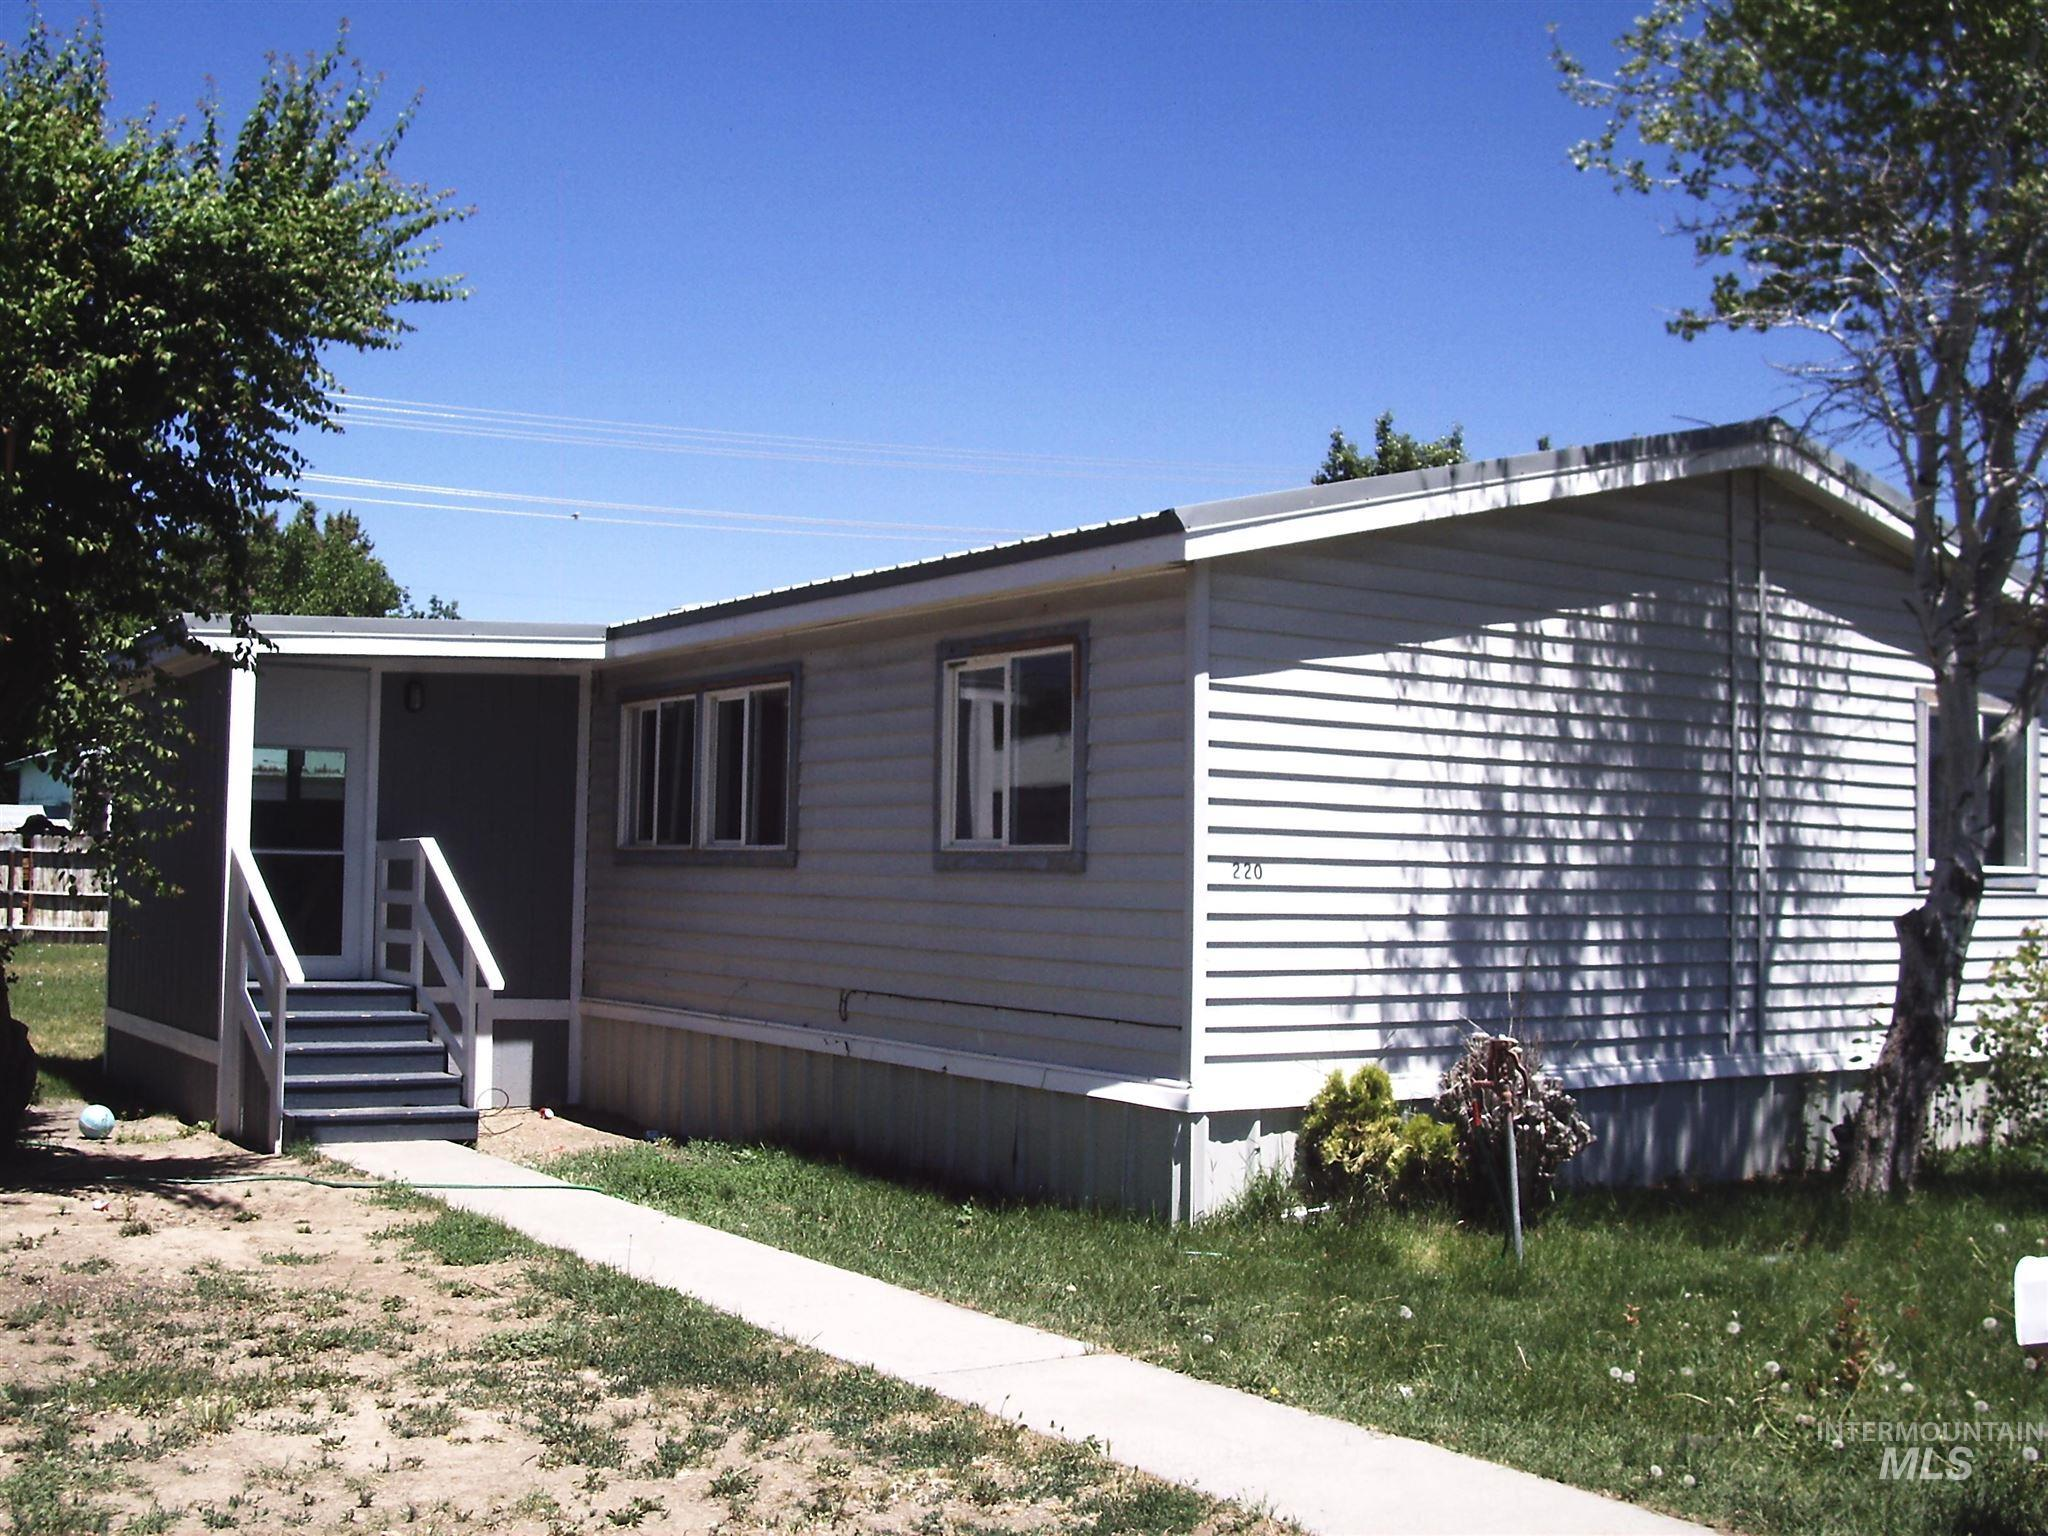 220 G Ave West Property Photo 1